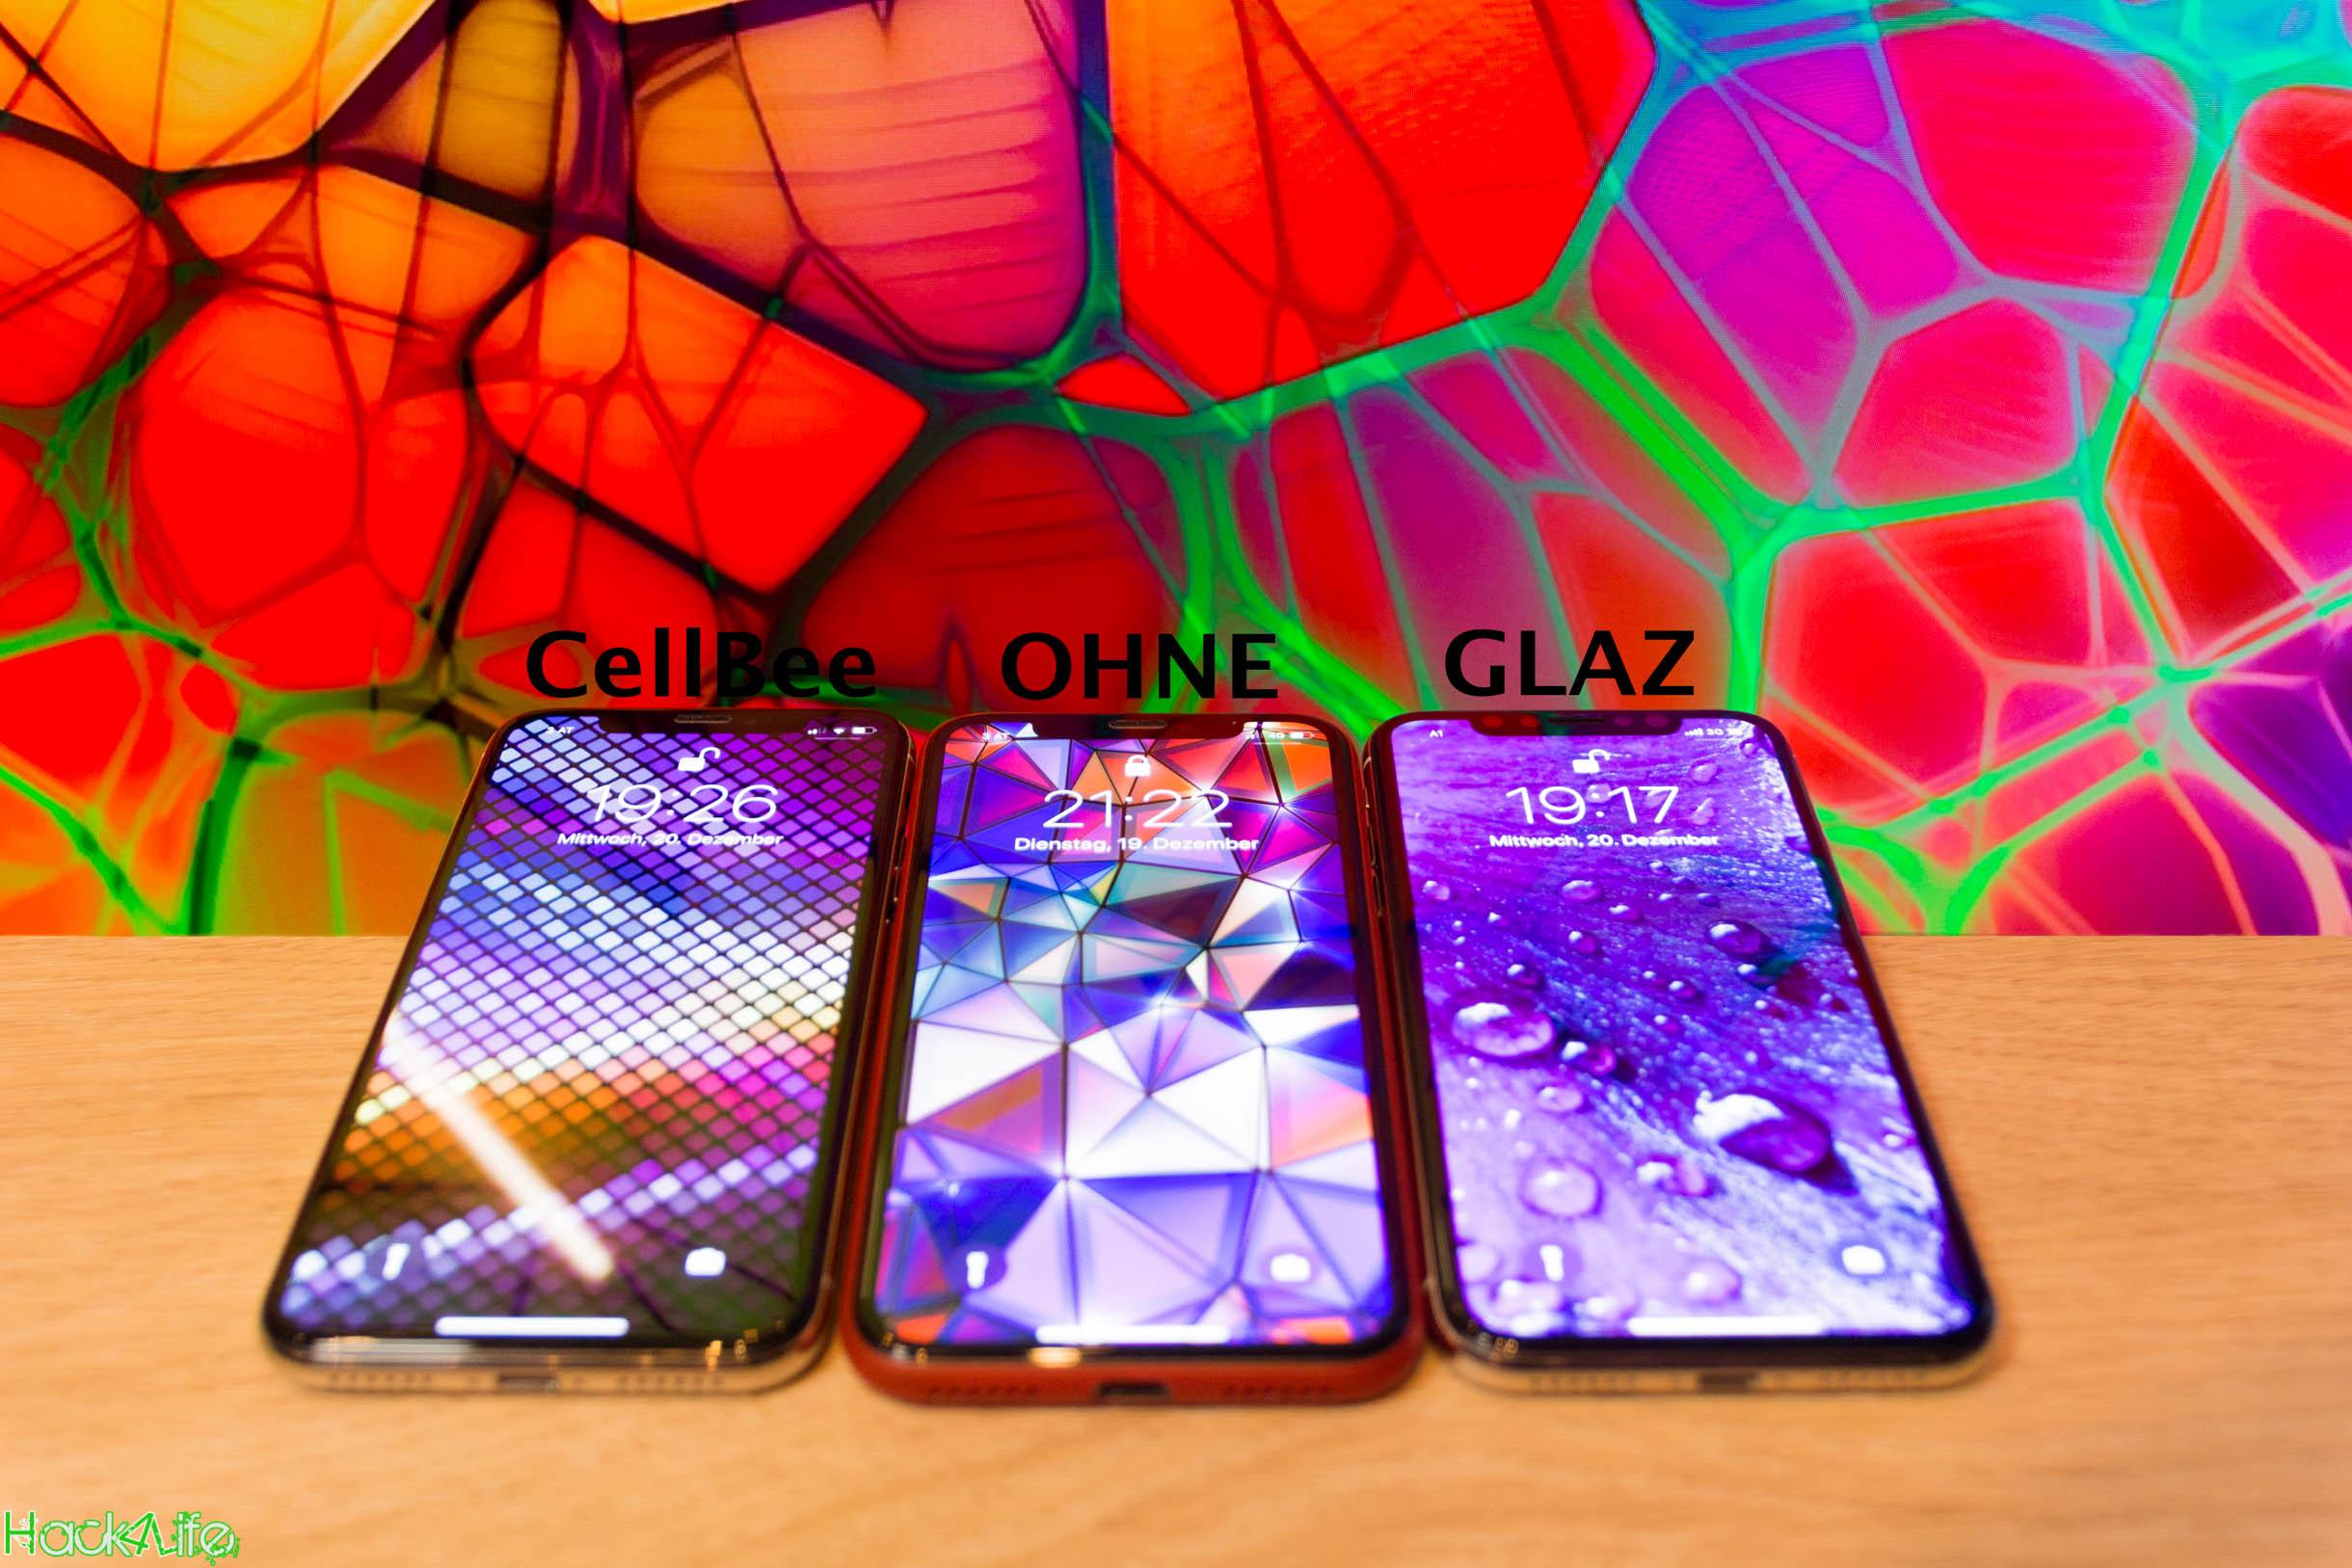 CellBee vs. GLAZ, iPhone X, Direkter vergleich, Hack4Life, Fabian Geissler